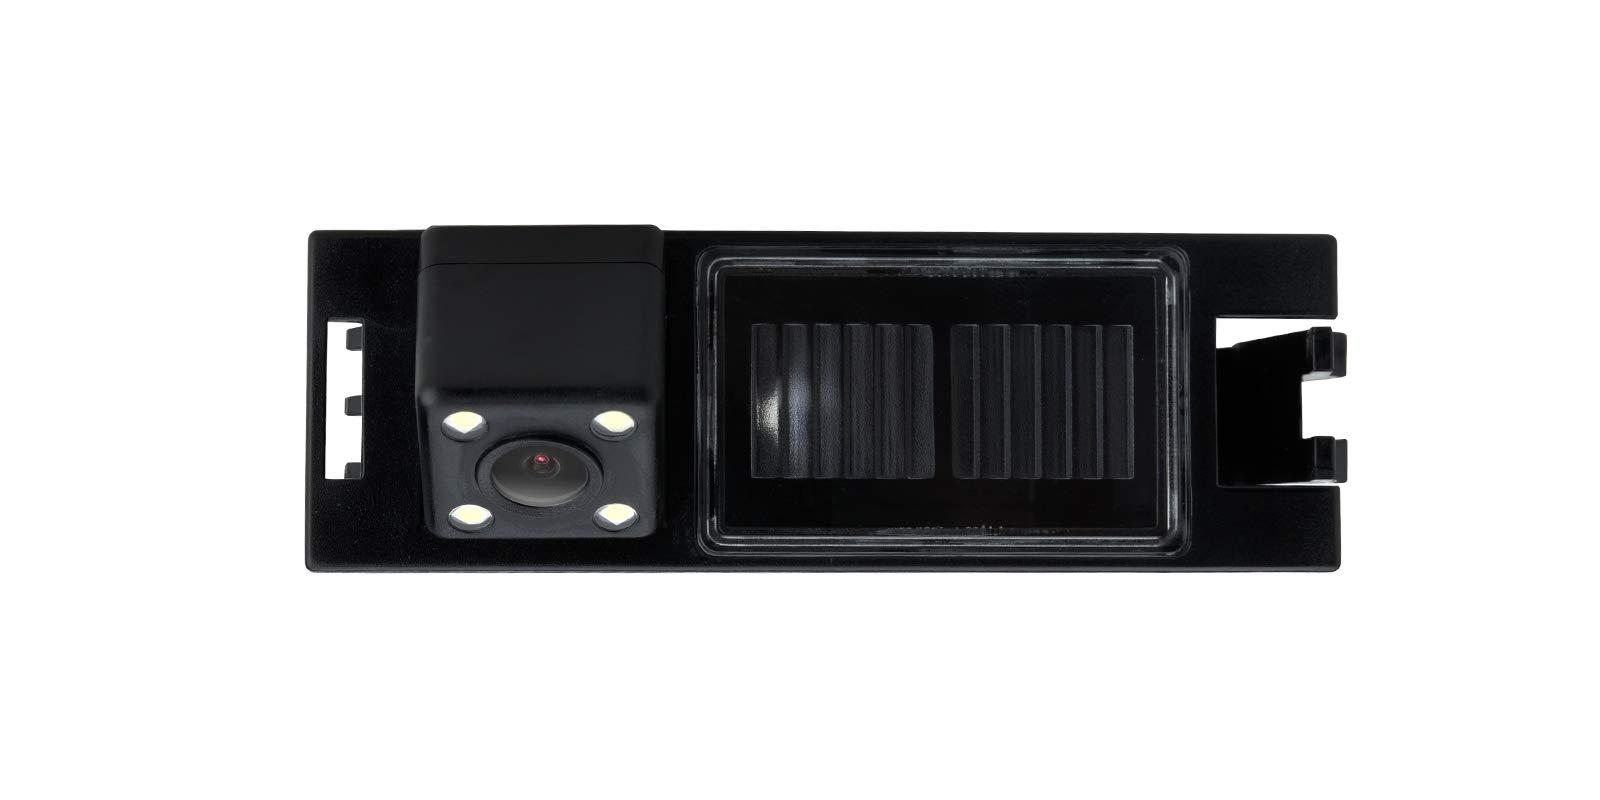 XTRONS-Rckfahrkamera-170–Weitwinkelobjektiv-Wasserdicht-Rckfahrsystem-Einparkshilfe-fr-Hyundai-IX35